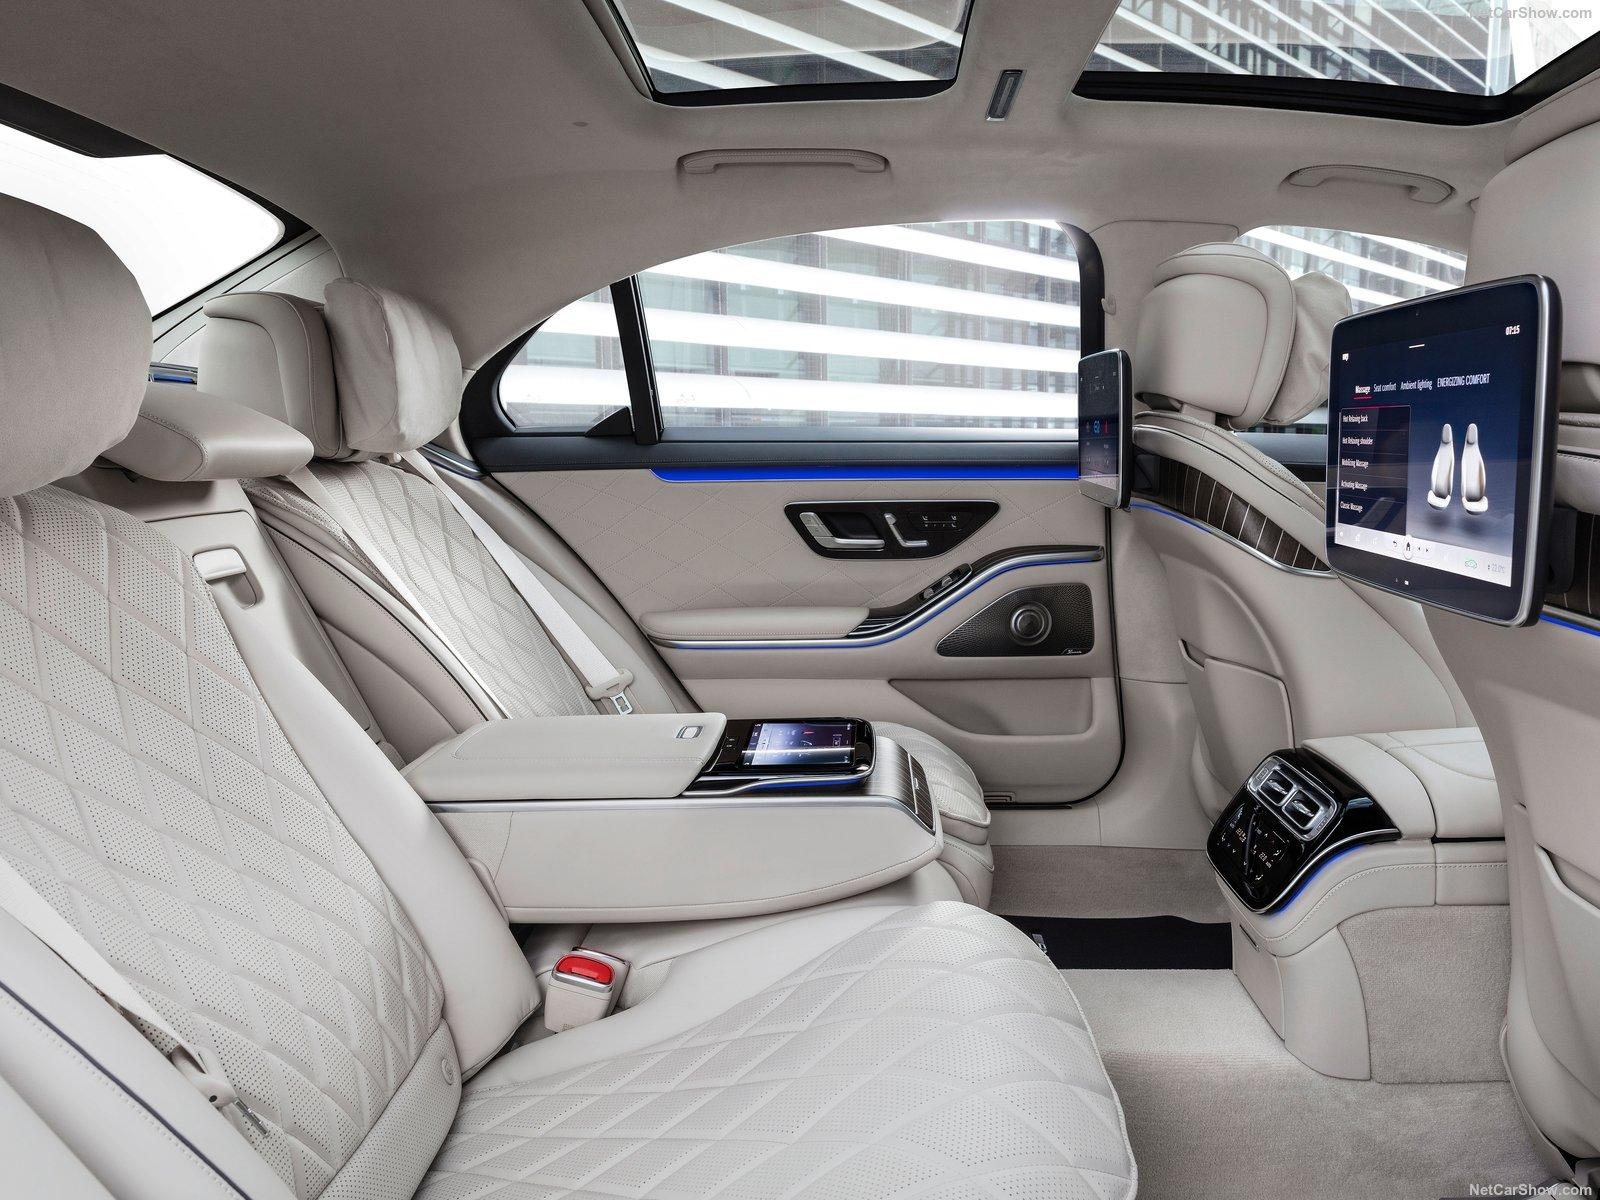 Mercedes S-Class W223 interior